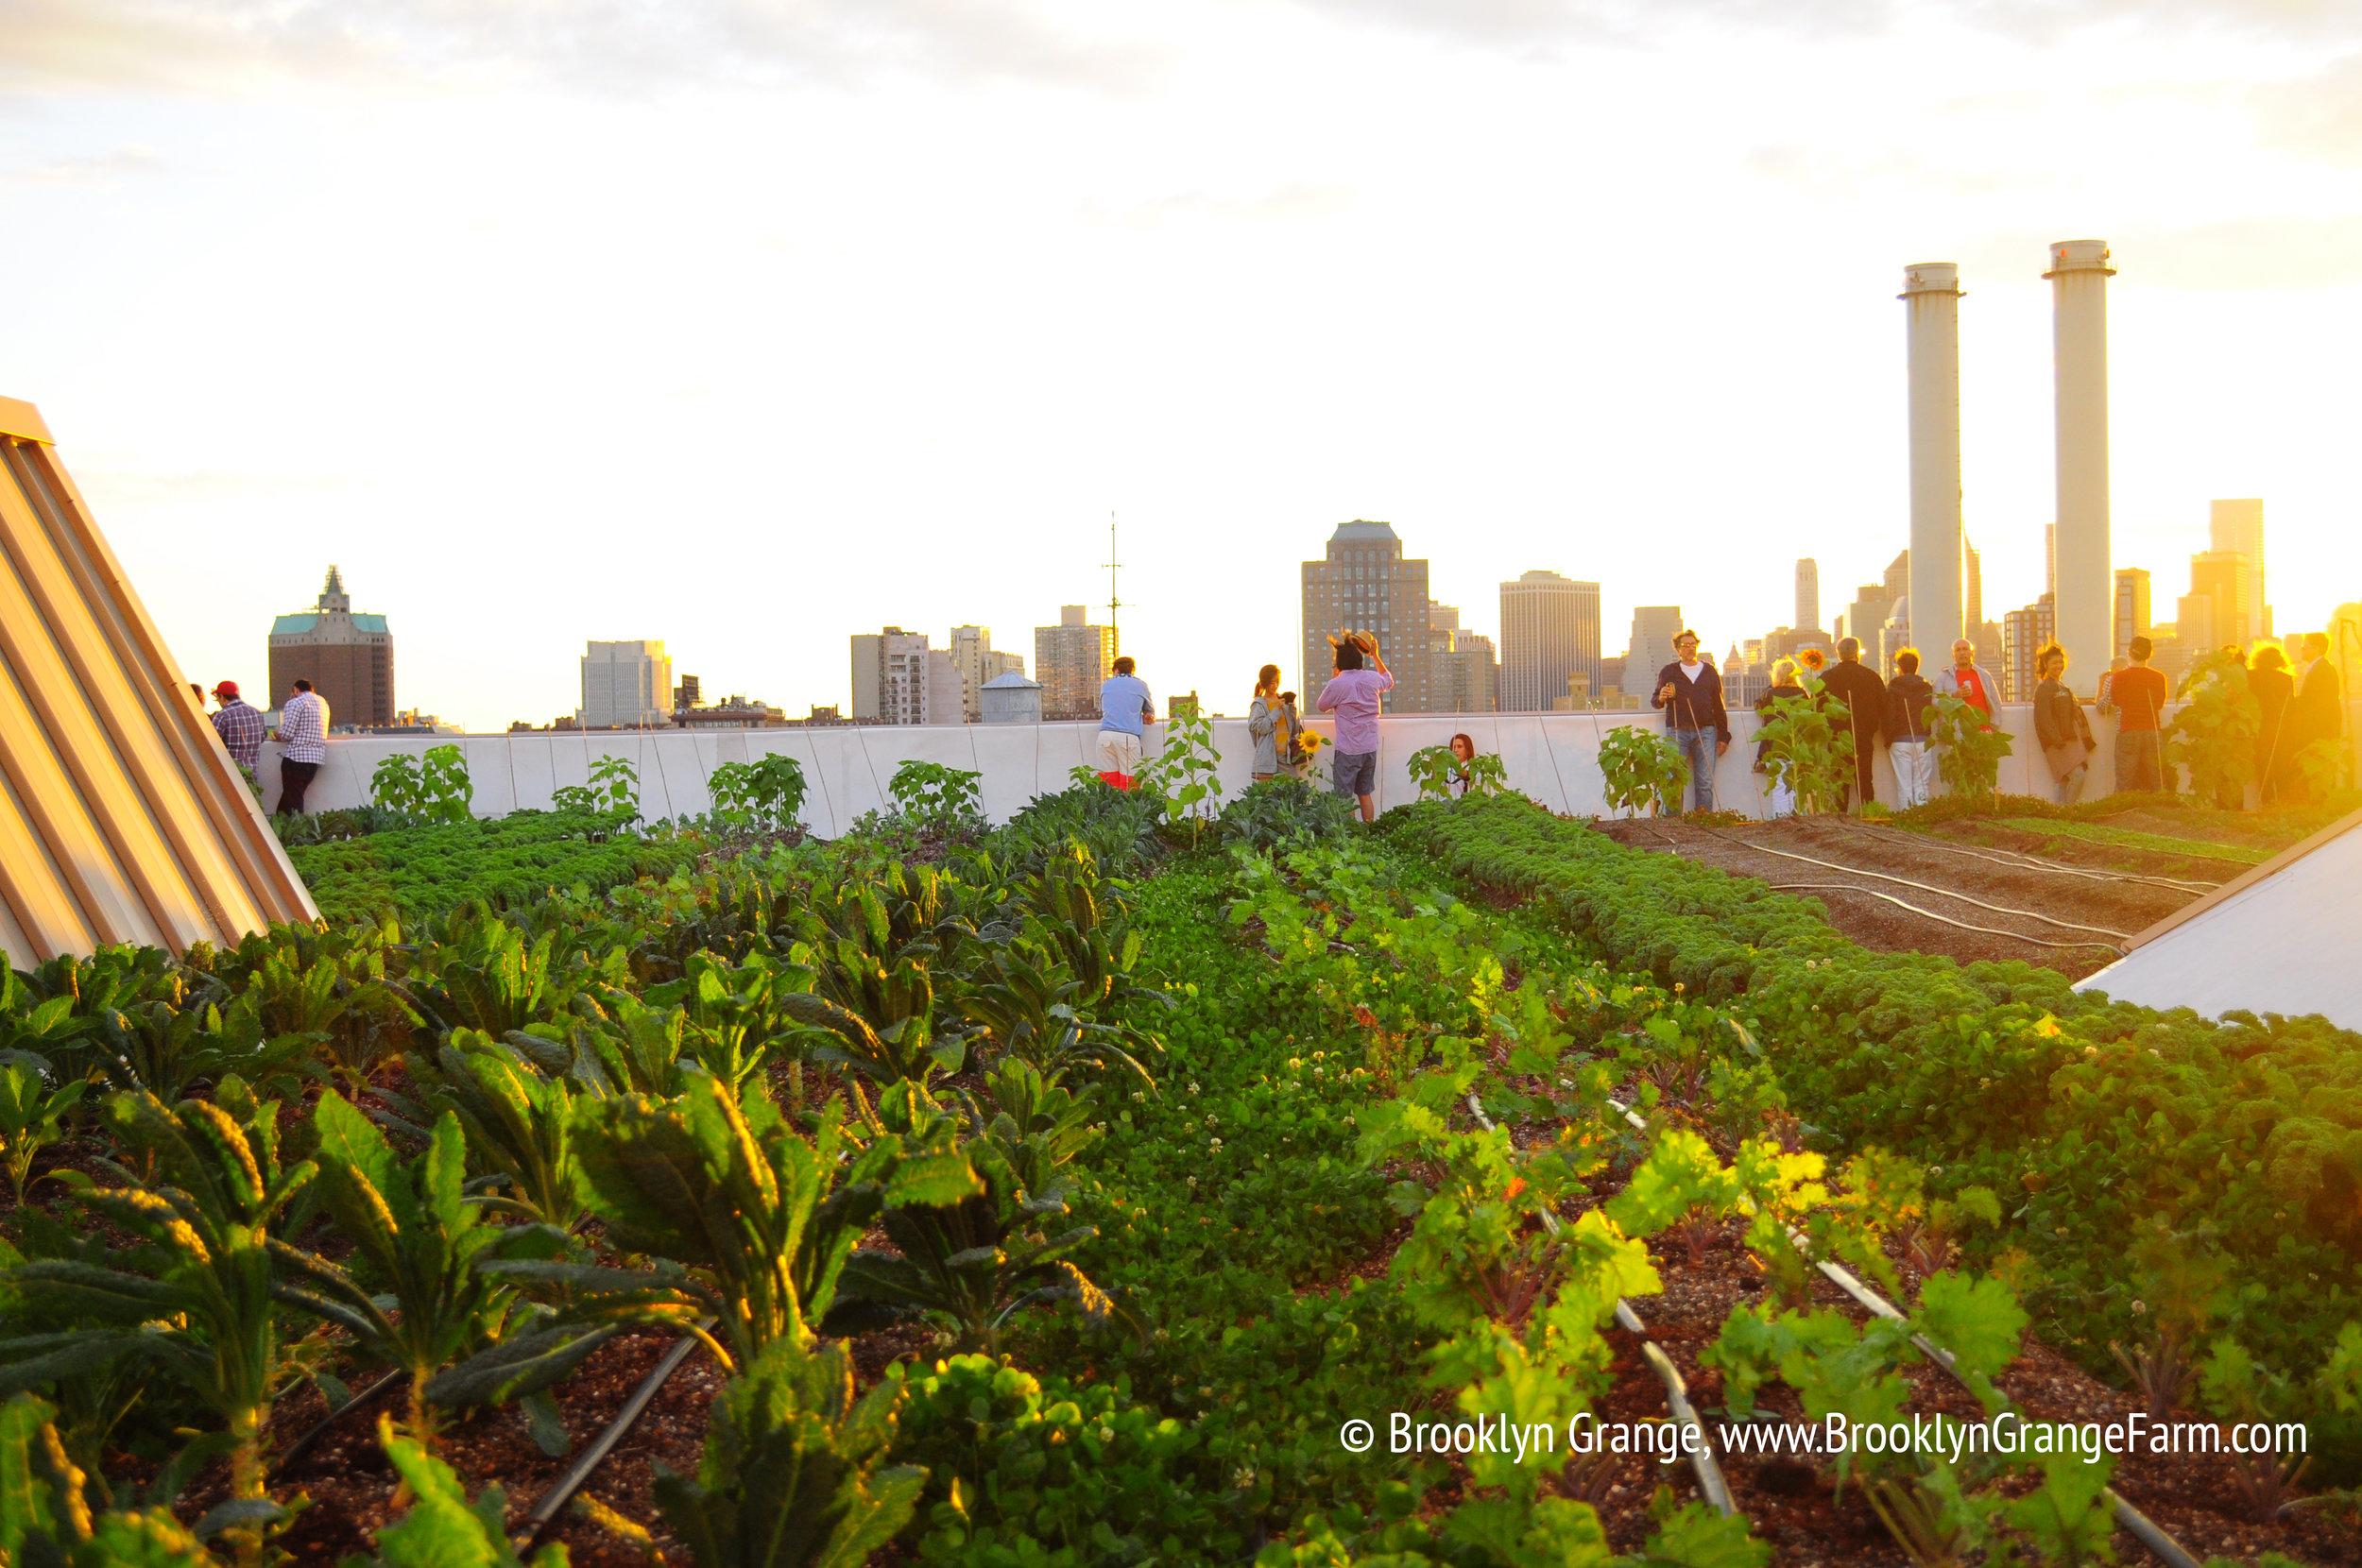 Image courtesy of Brooklyn Grange Farms